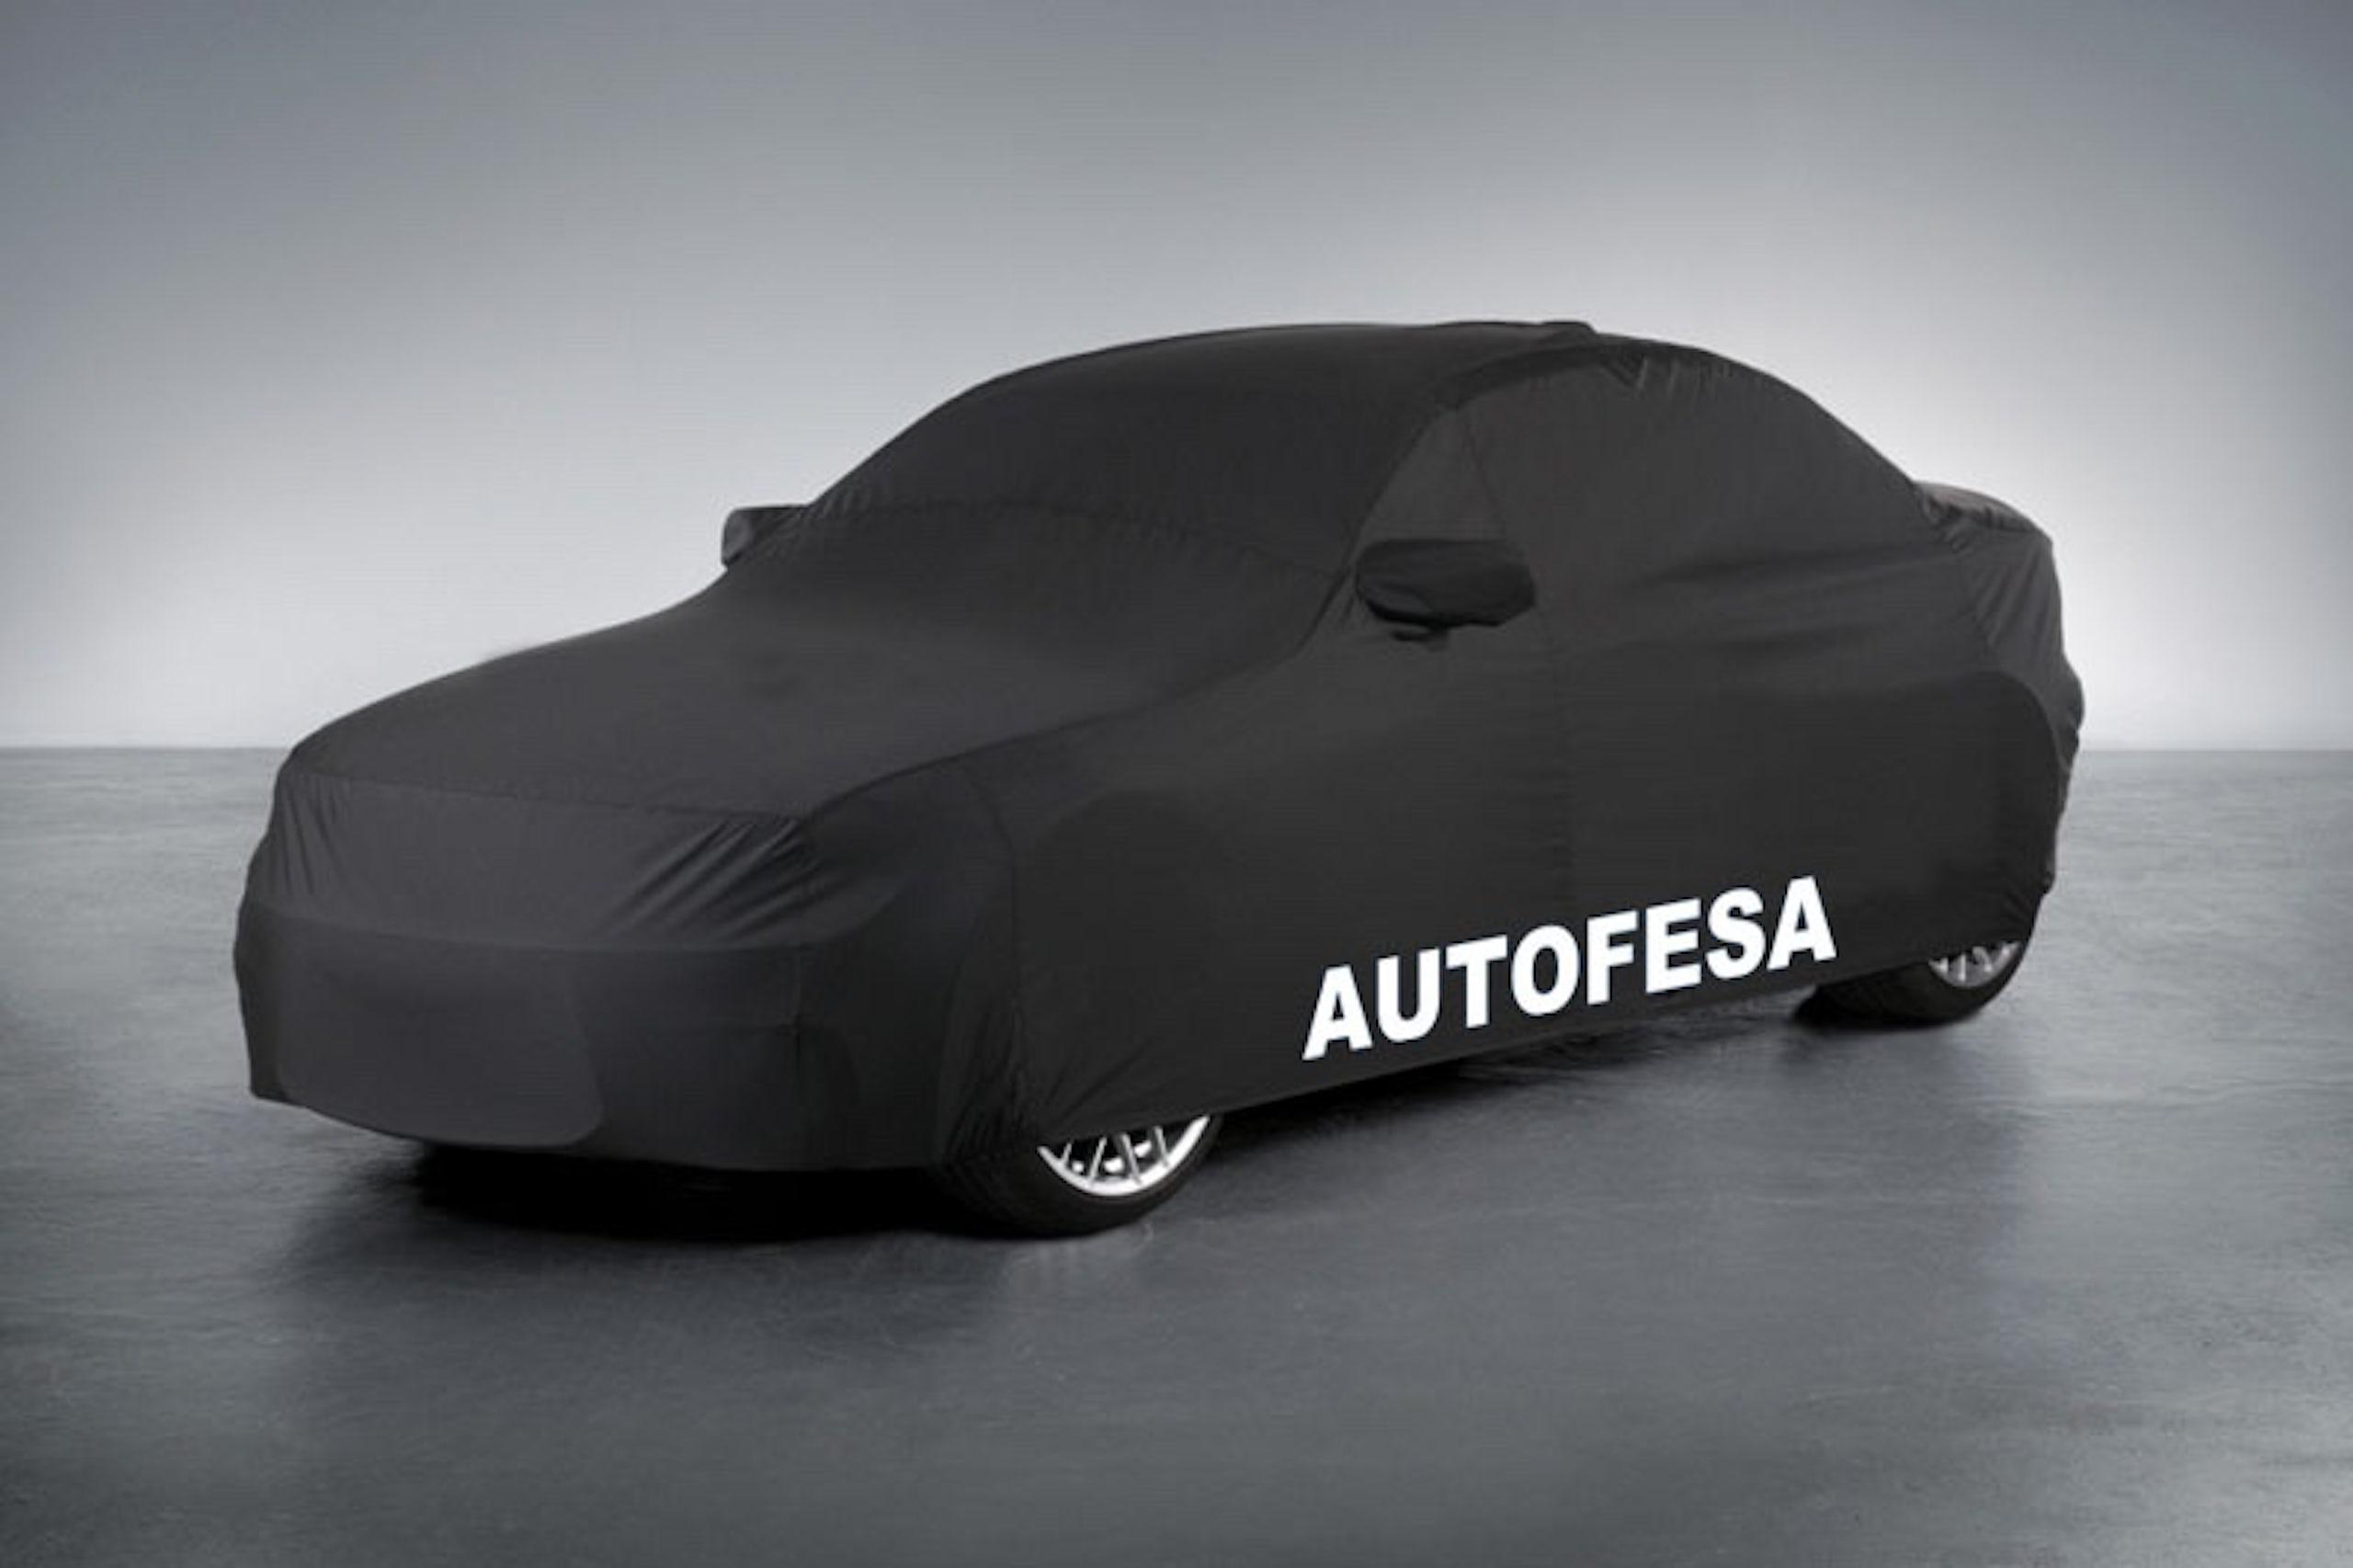 Audi Q5 2.0 TDI 170cv quattro 5p S tronic Auto - Foto 14